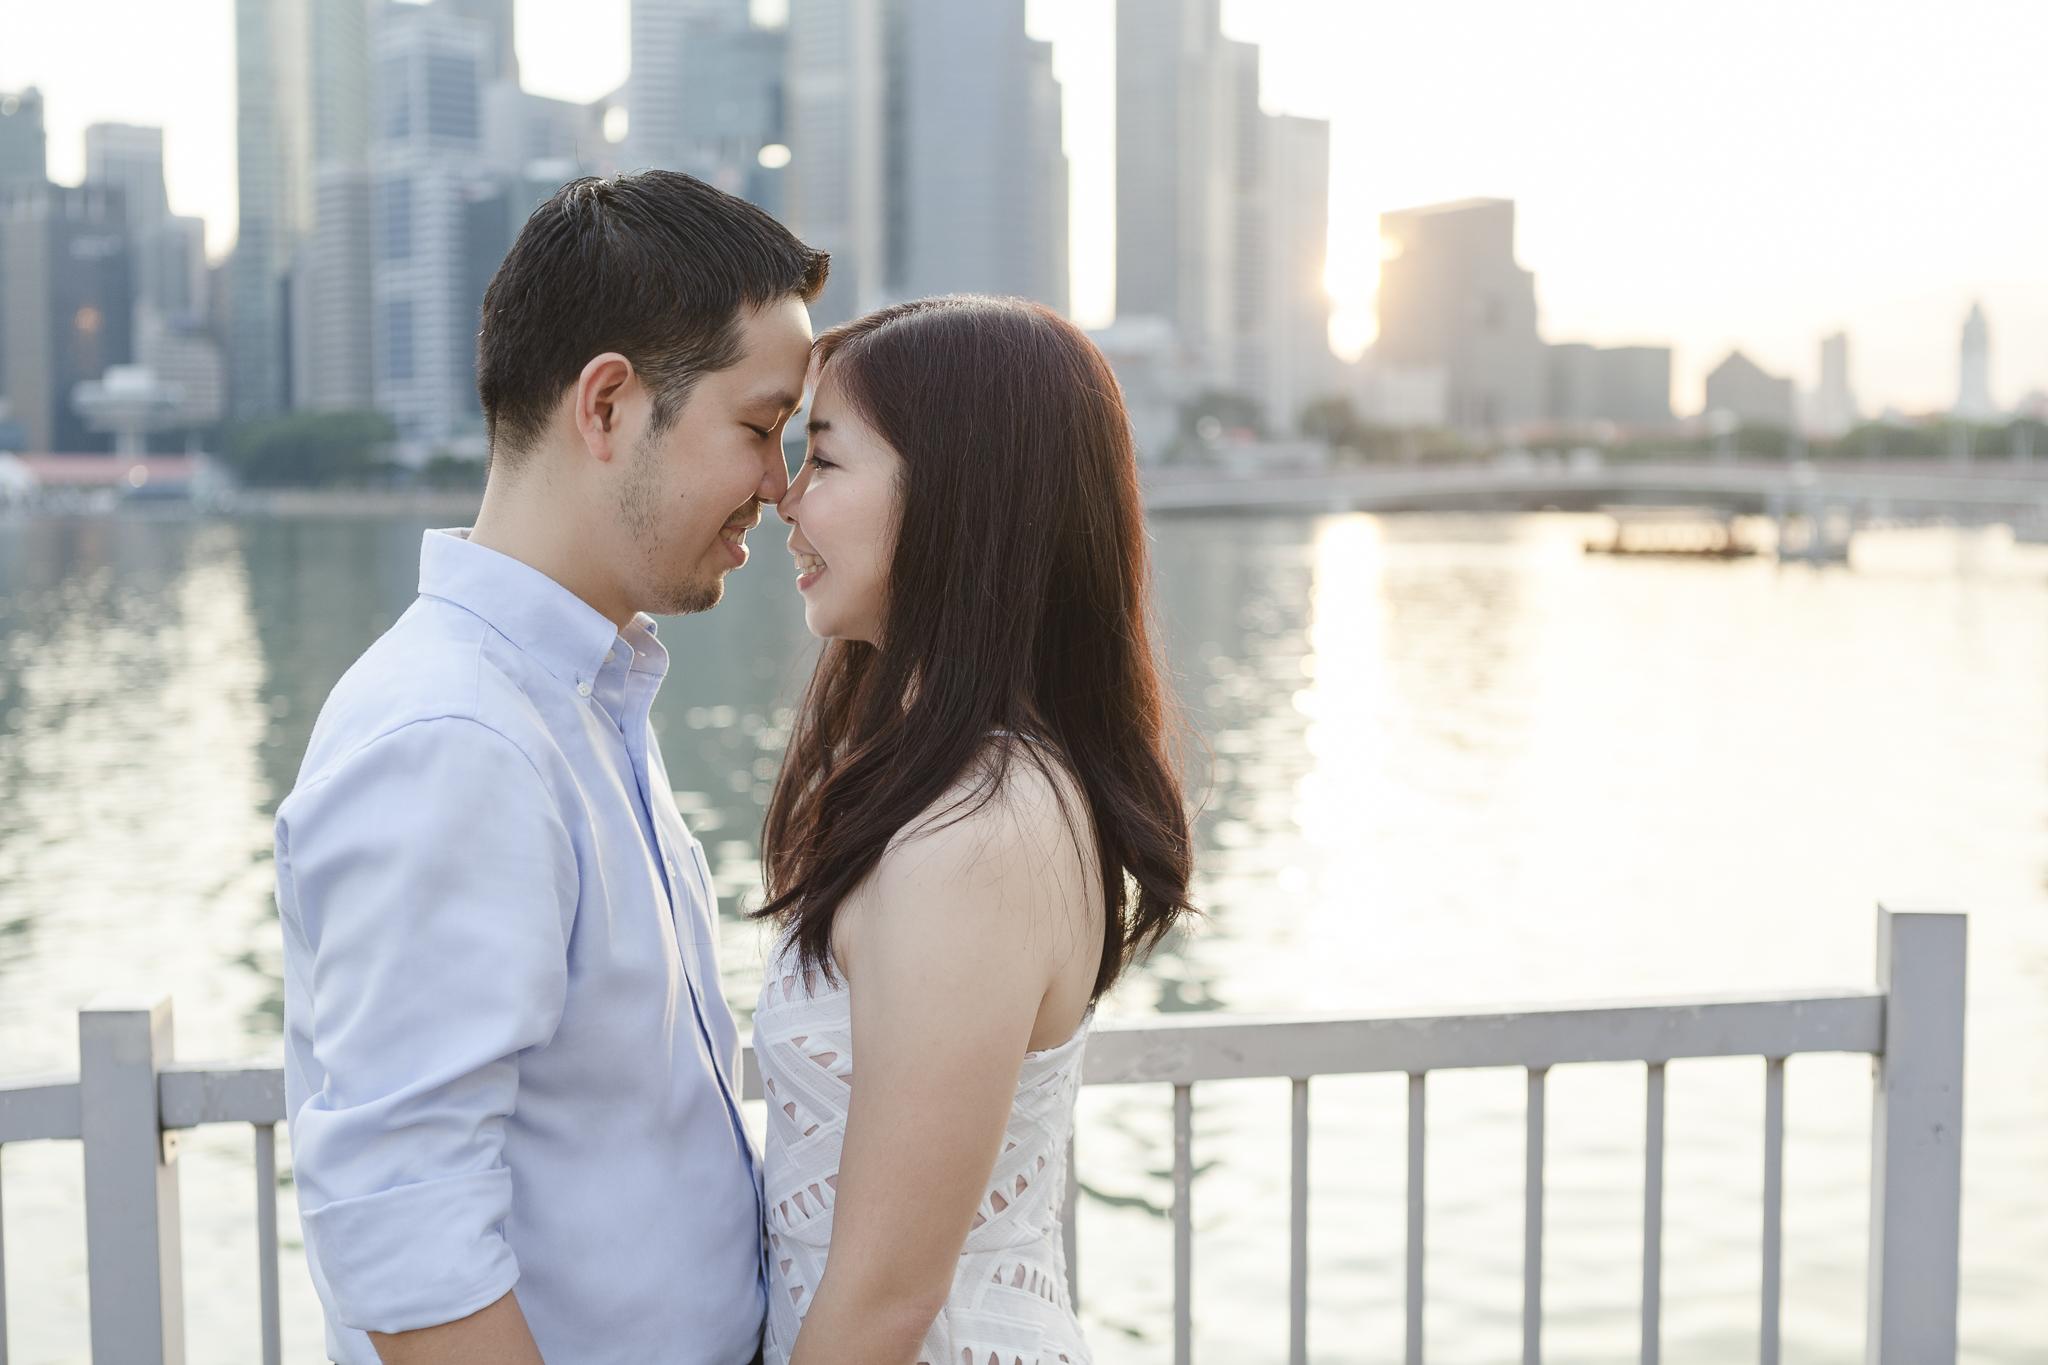 Paarshooting in Singapur - Paar in Singapur kuschelt sich aneinander